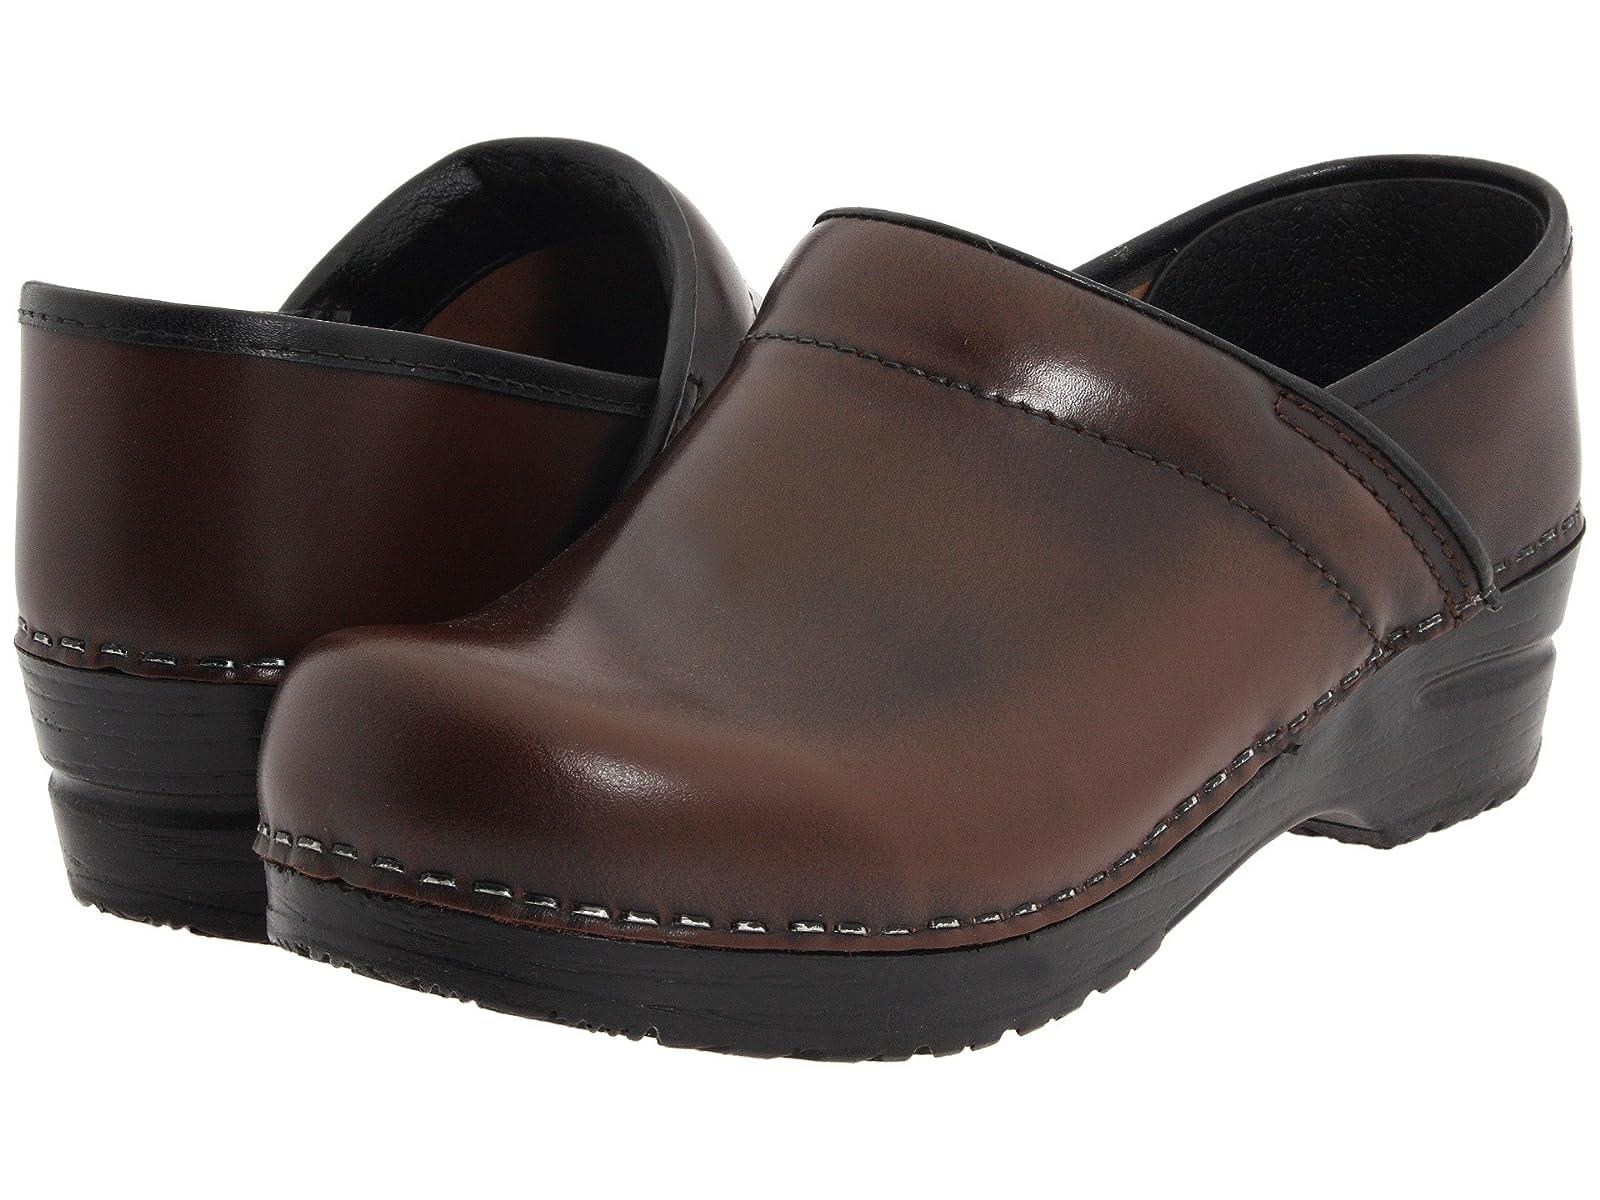 Sanita Professional CabrioAtmospheric grades have affordable shoes